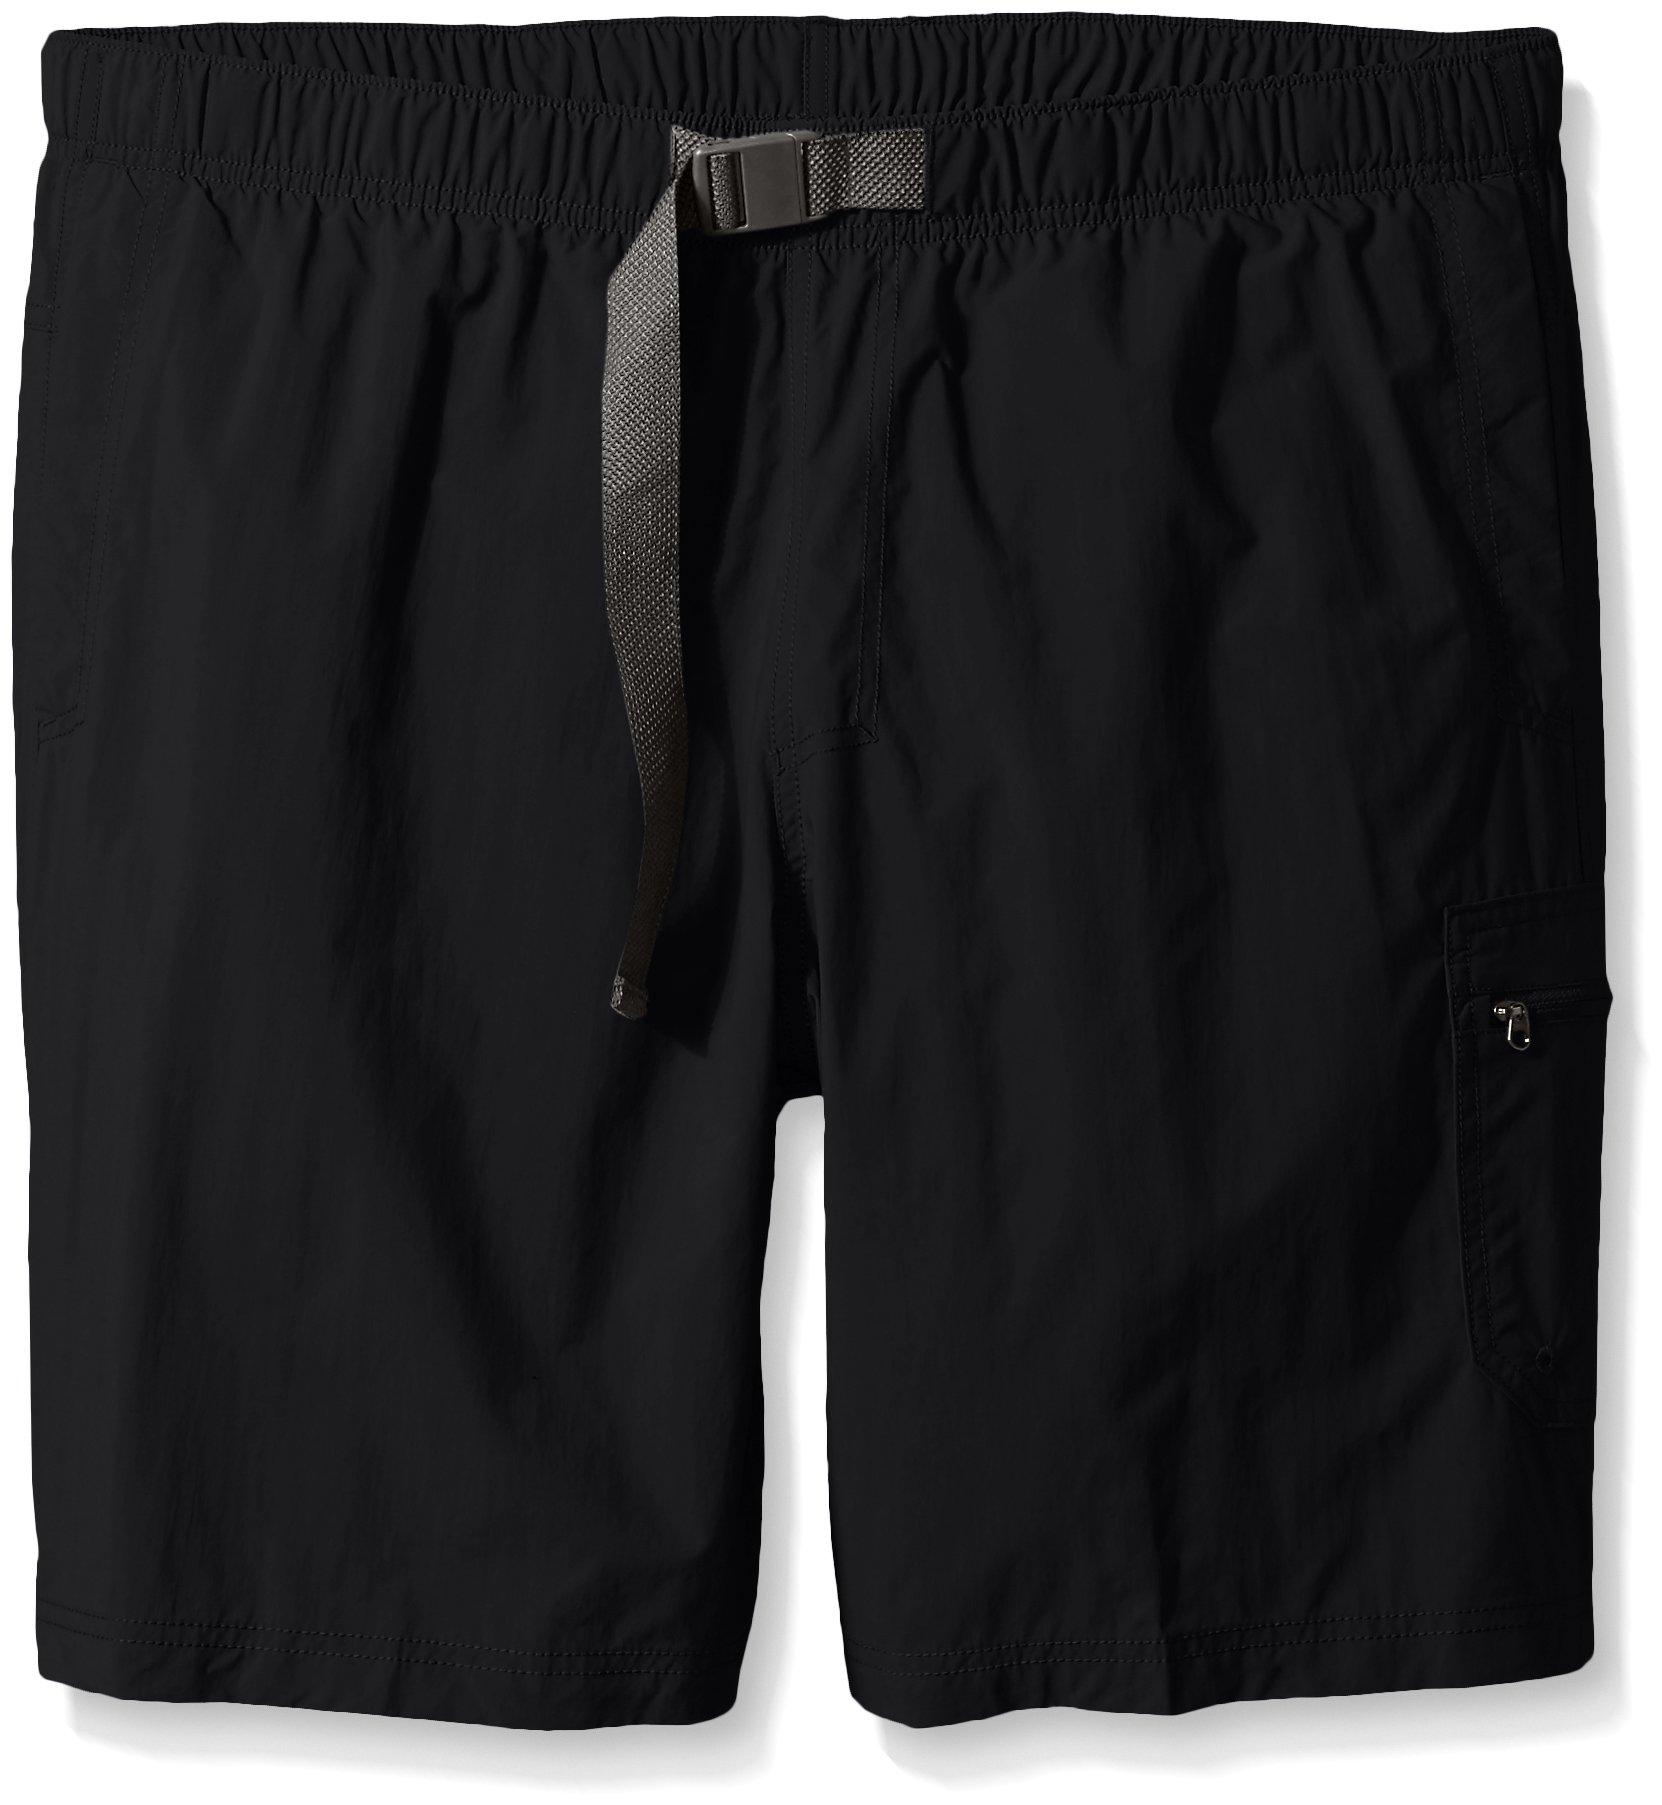 Columbia Men's Palmerston Peak Short, Waterproof, UV Sun Protection, Black, 3X x 9'' Inseam